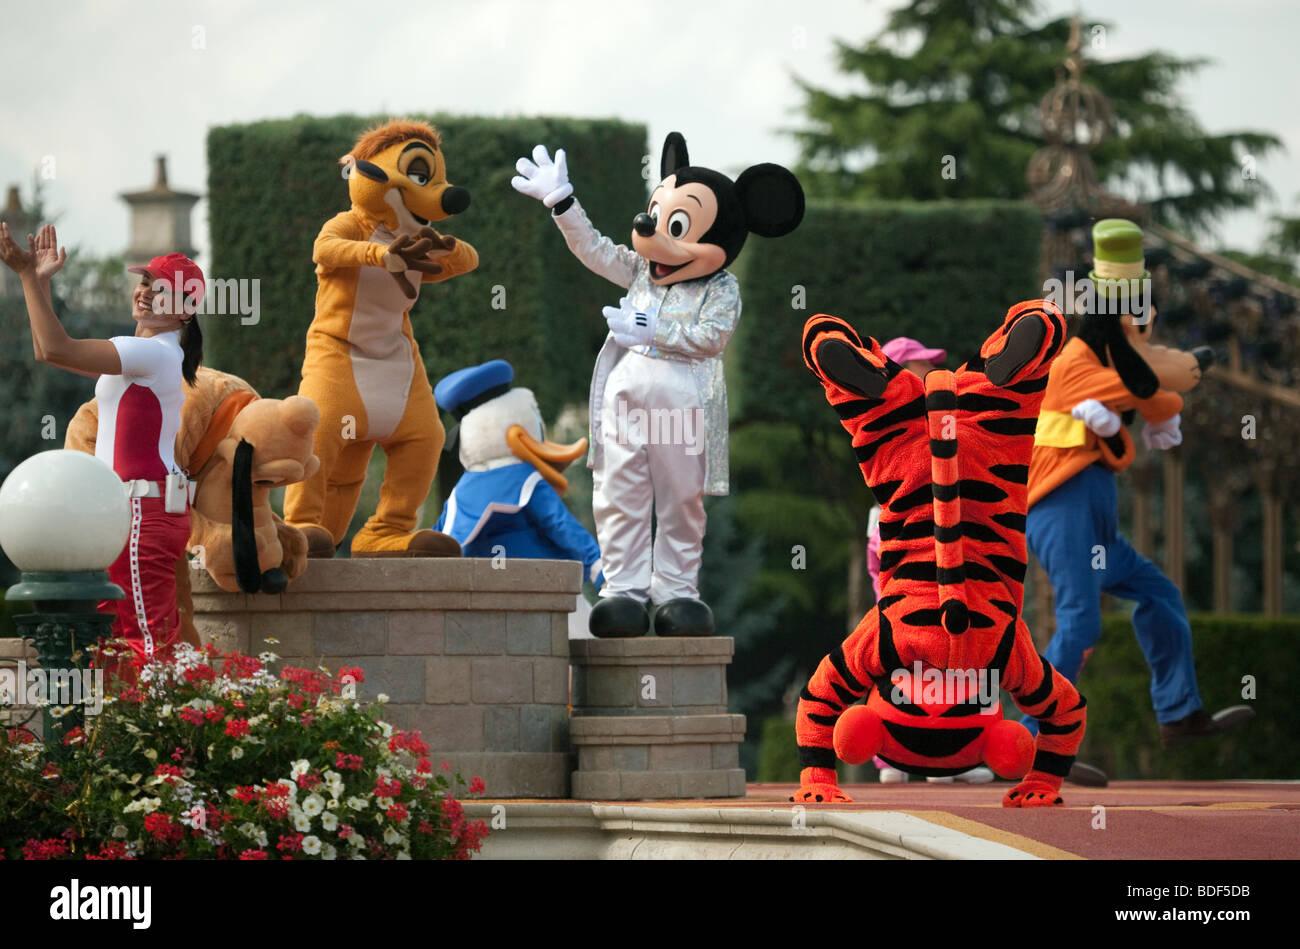 Disney Characters at disneyland, Paris, France - Stock Image